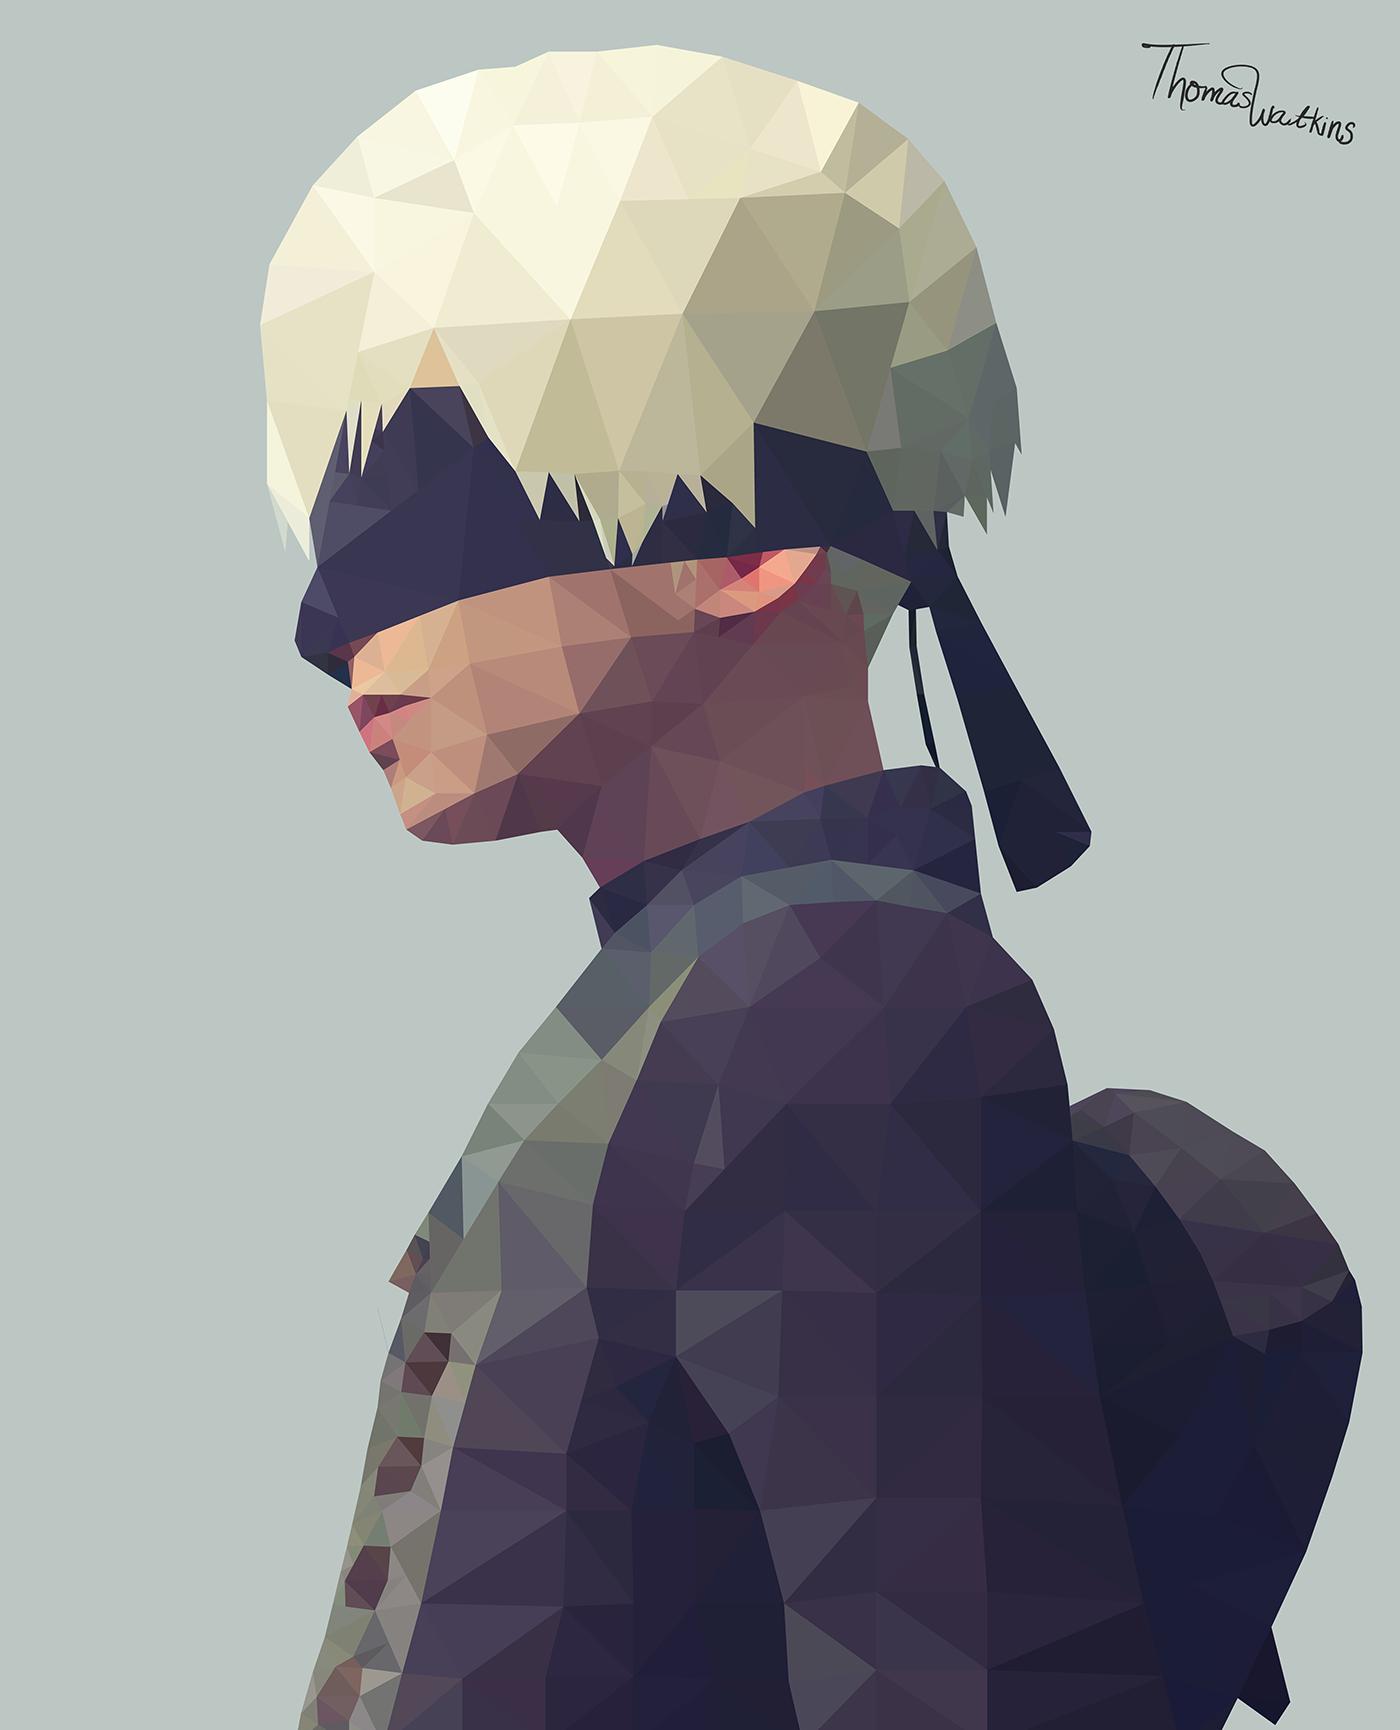 polygon art nier automata 9s